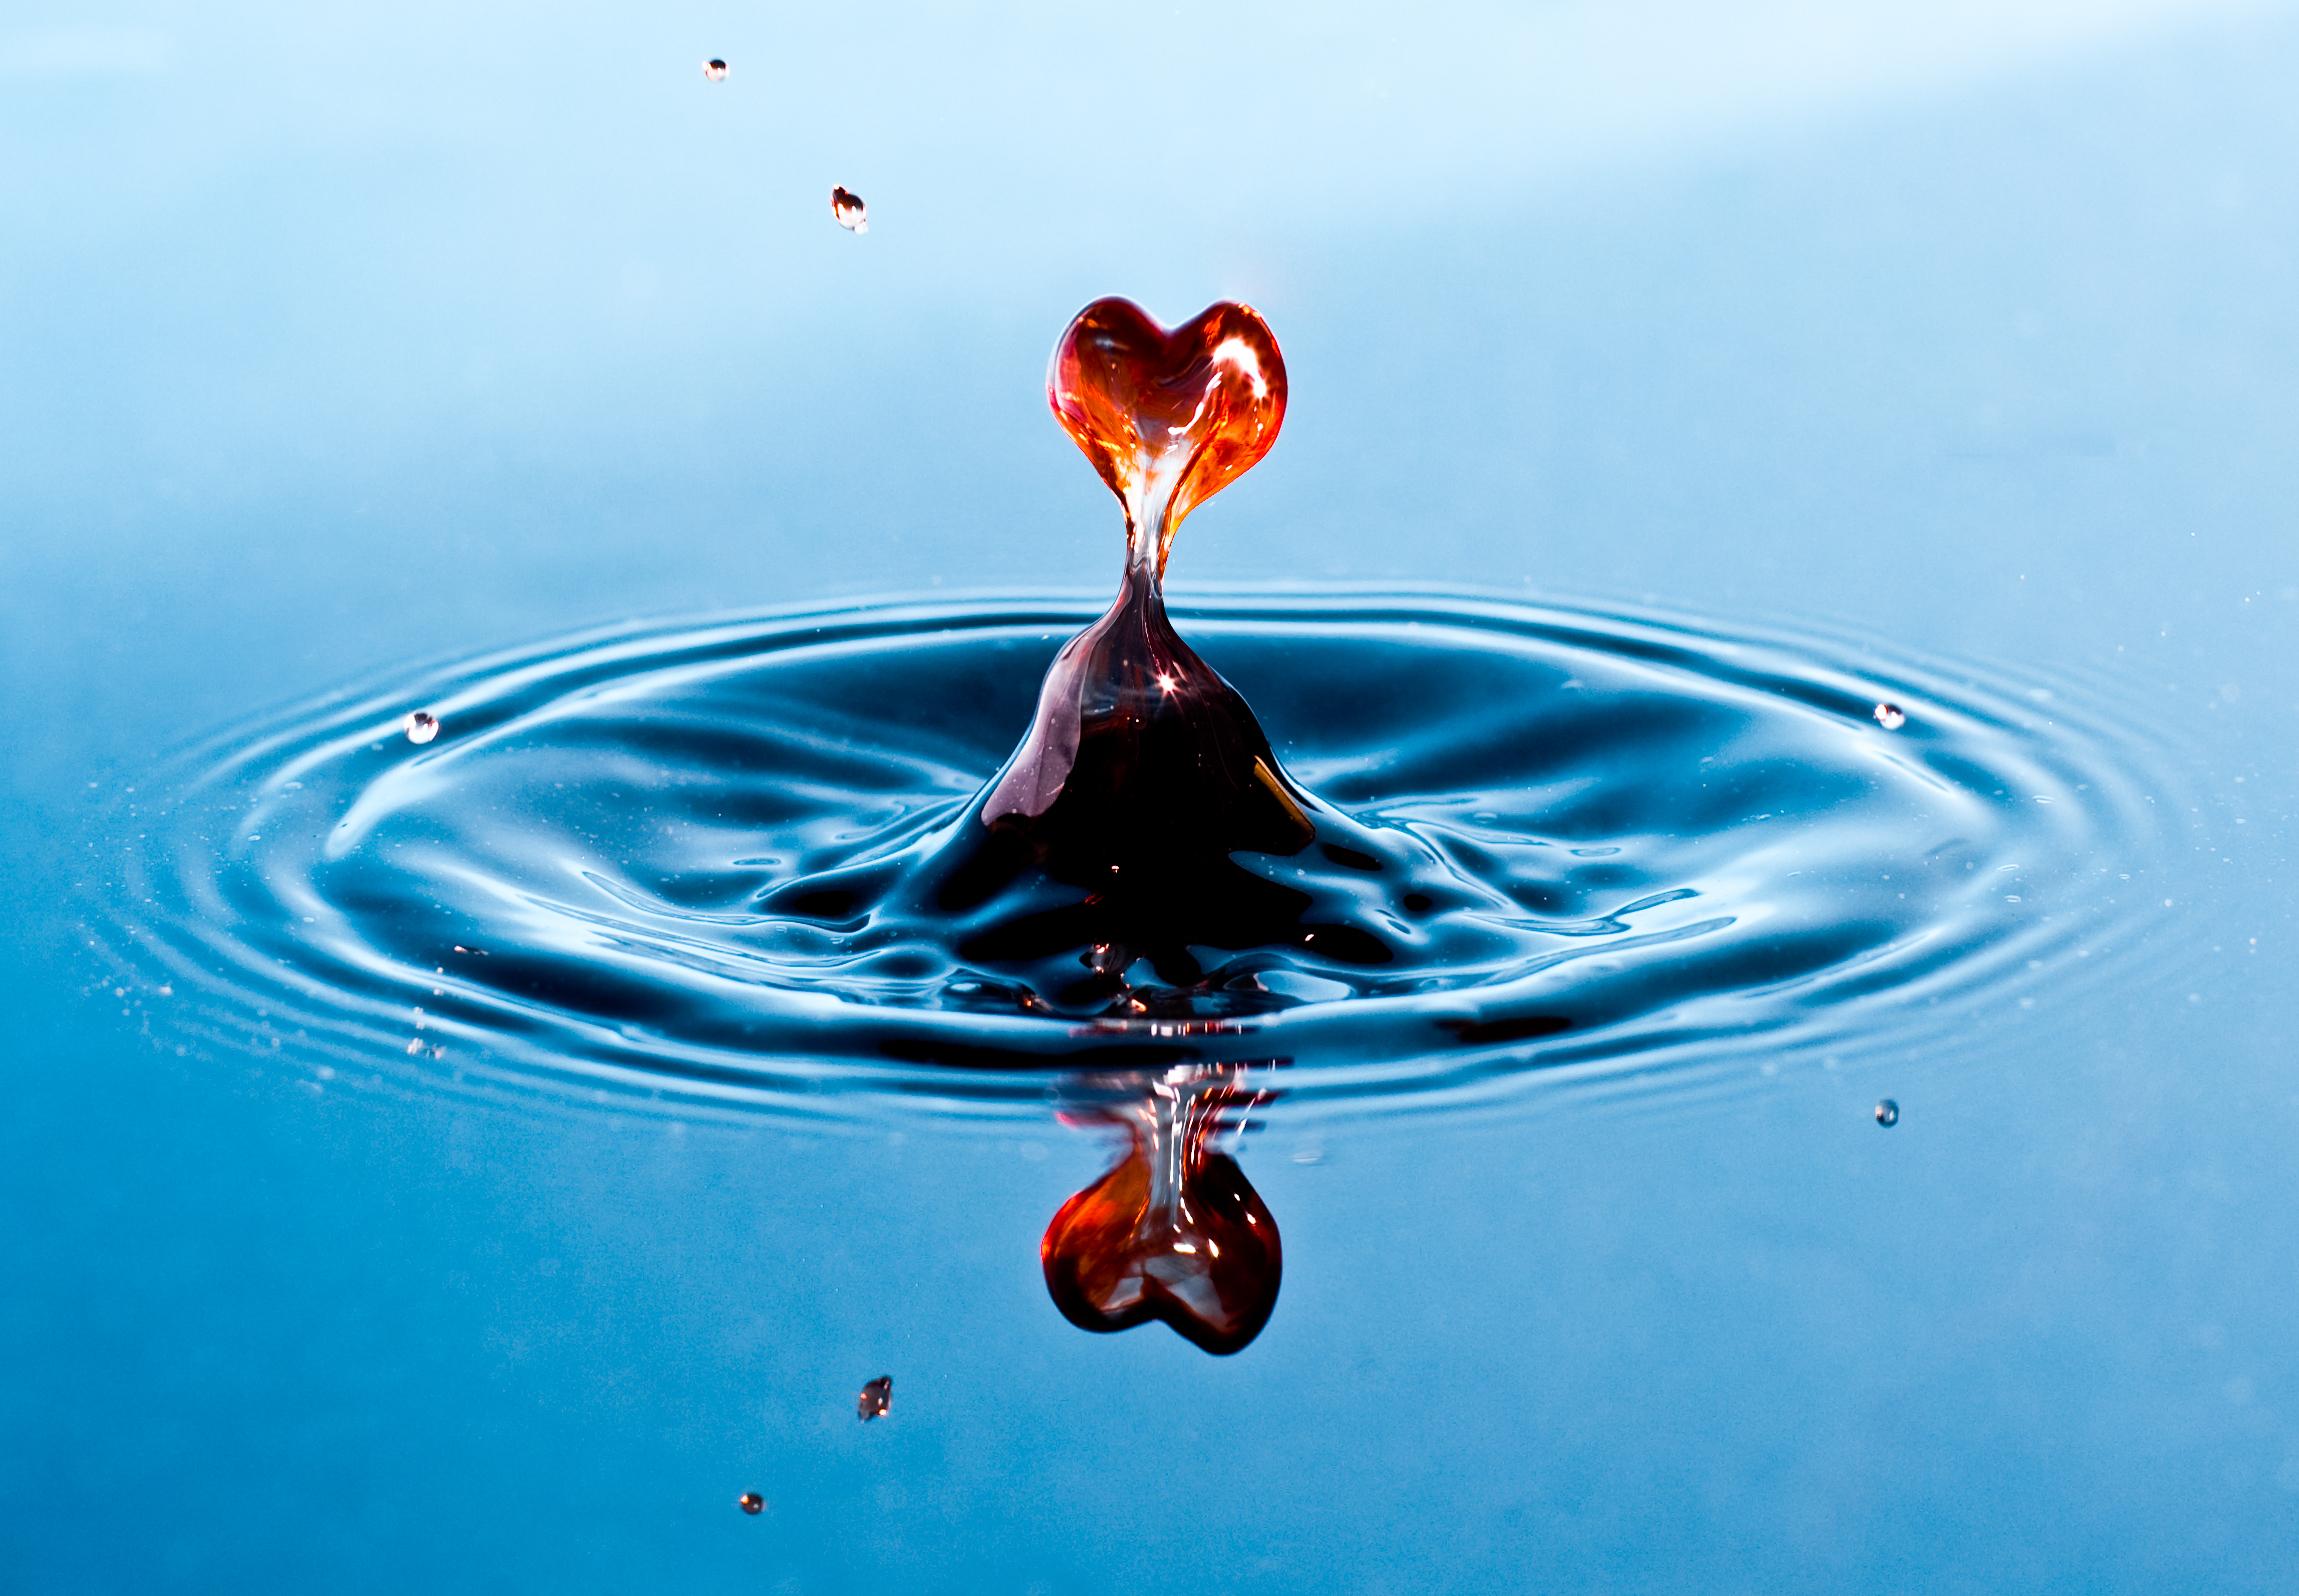 Split second love by Noxire